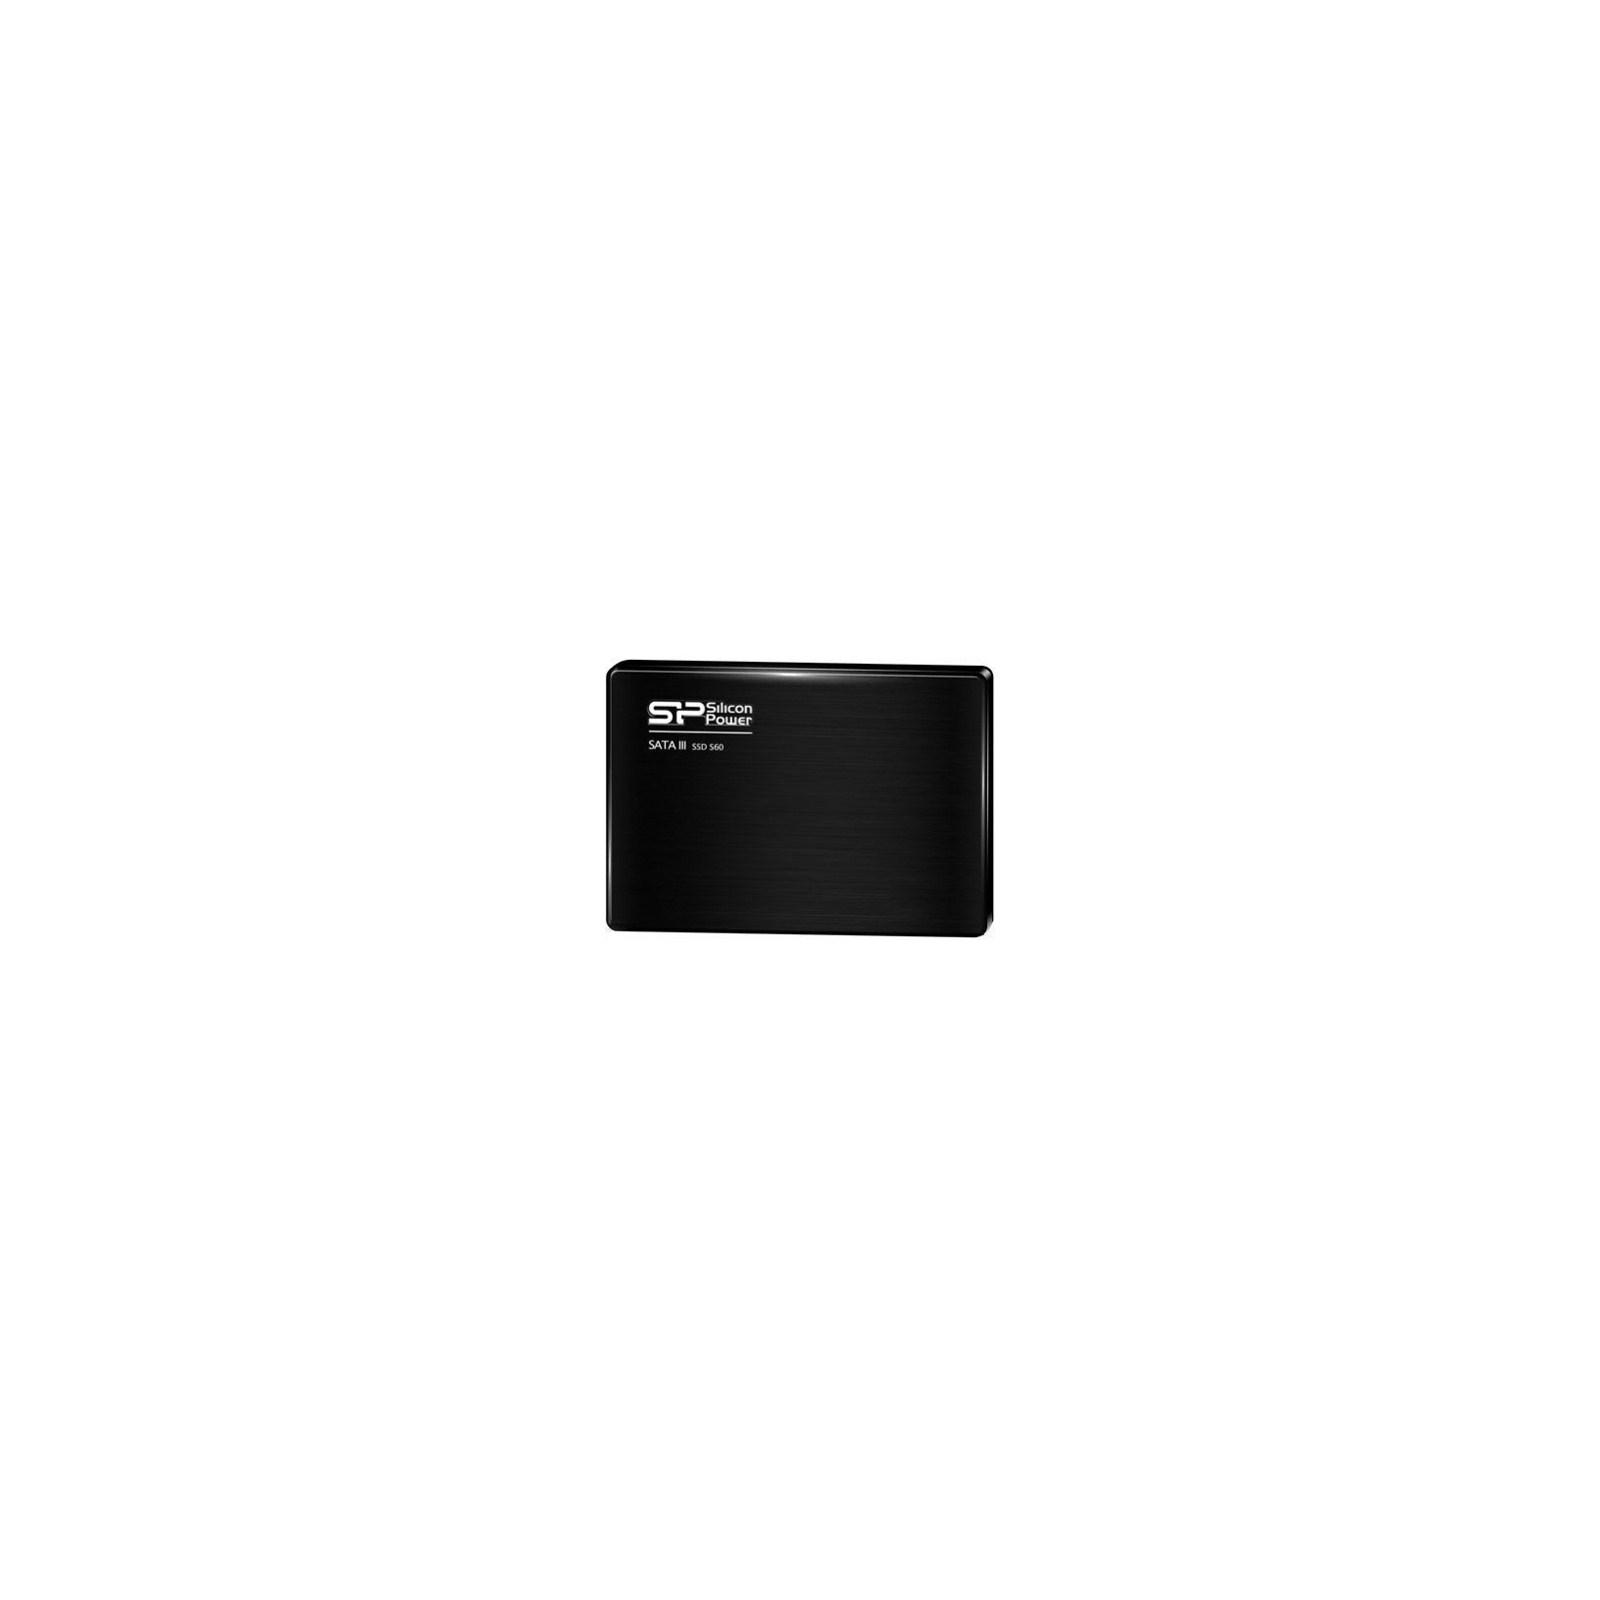 "Накопитель SSD 2.5"" 120GB Silicon Power (SP120GBSS3S60S25)"